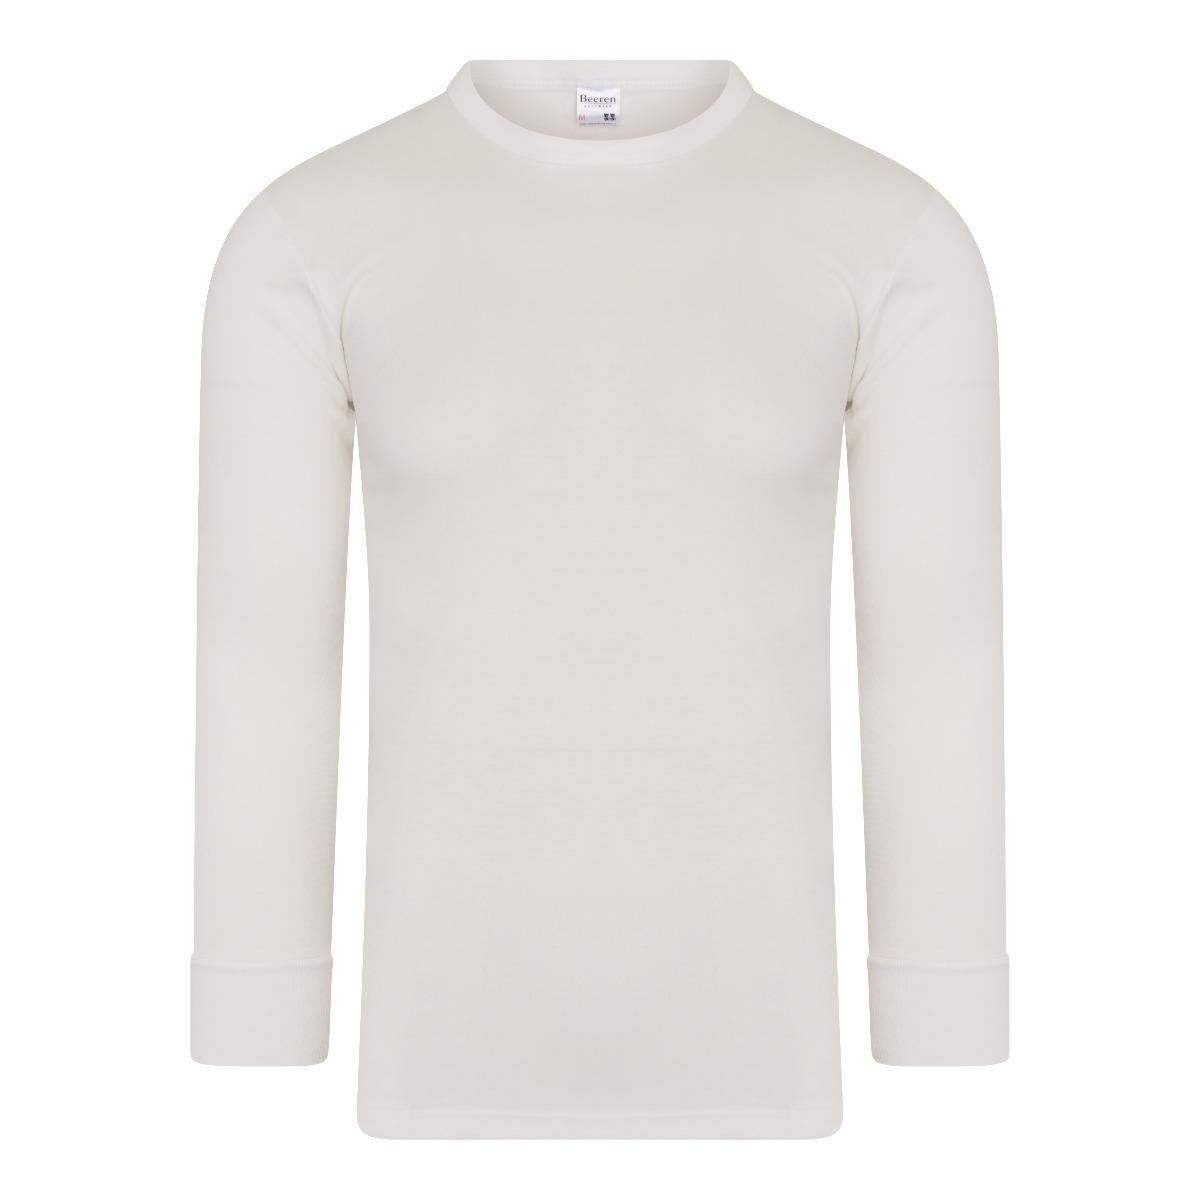 Beeren Thermo Heren Shirt Lange Mouw Wolwit L